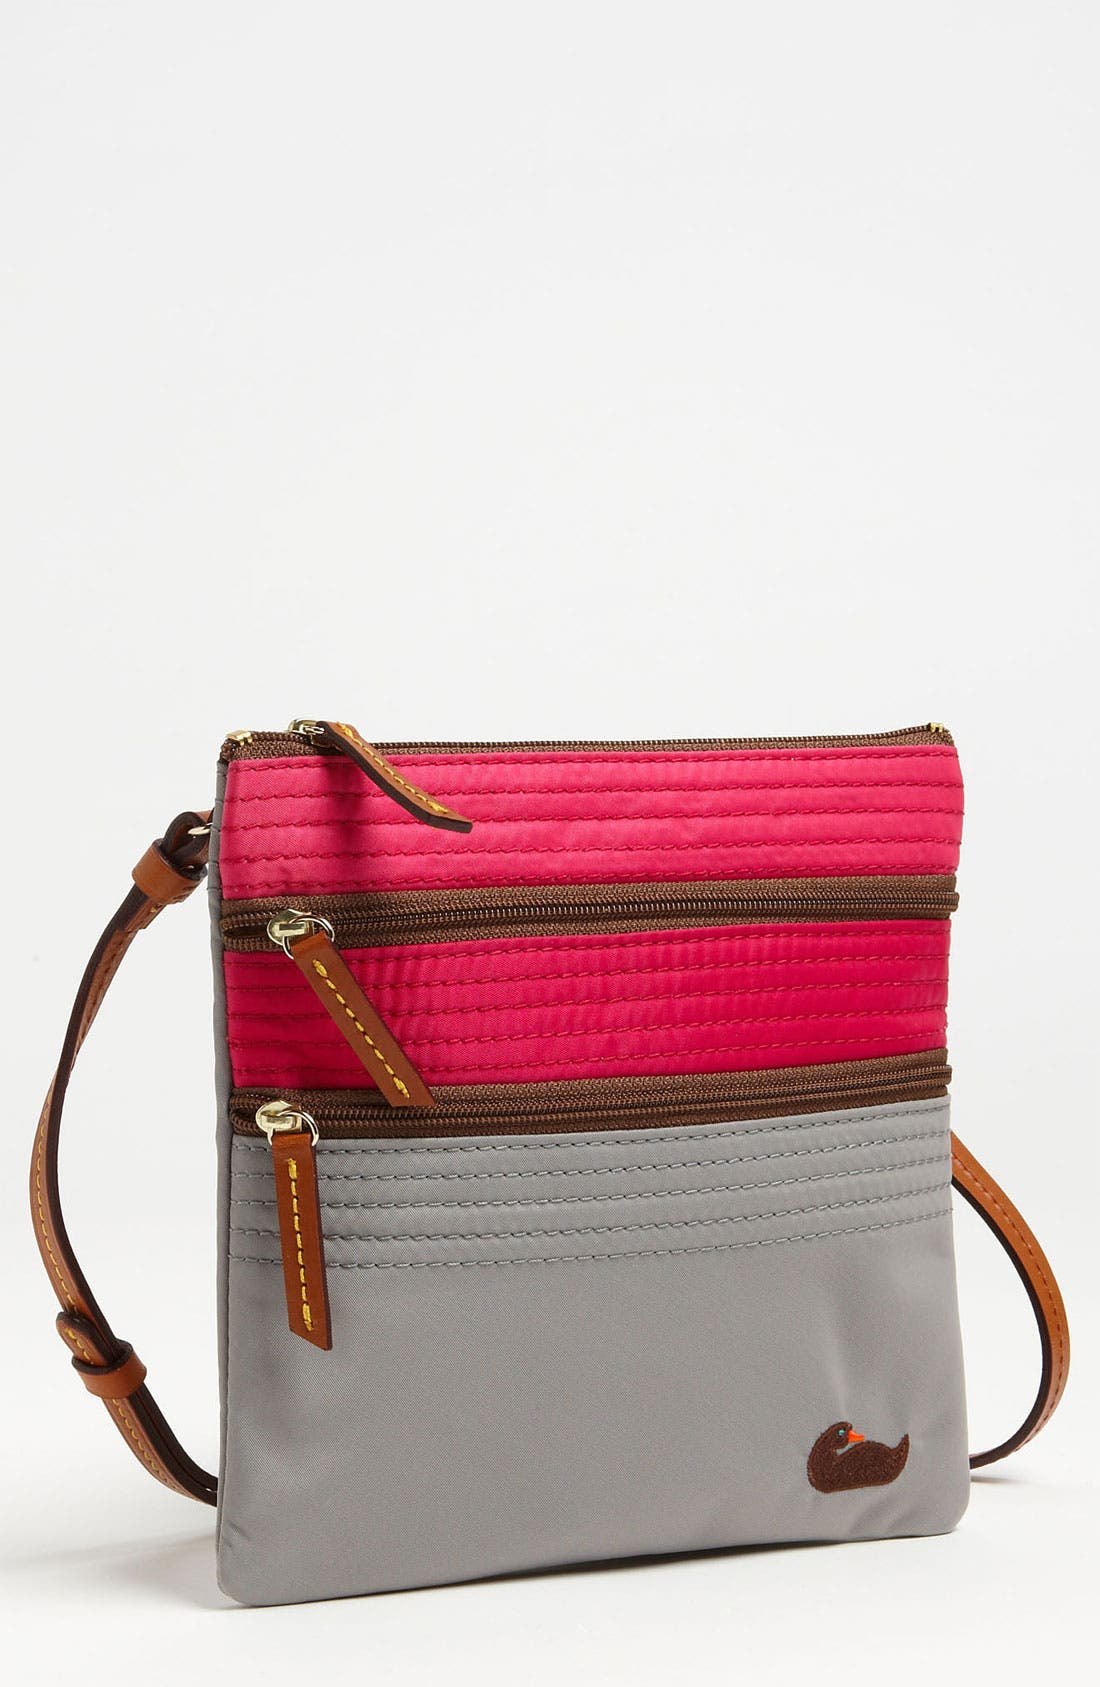 Alternate Image 1 Selected - Dooney & Bourke Triple Zip Crossbody Bag